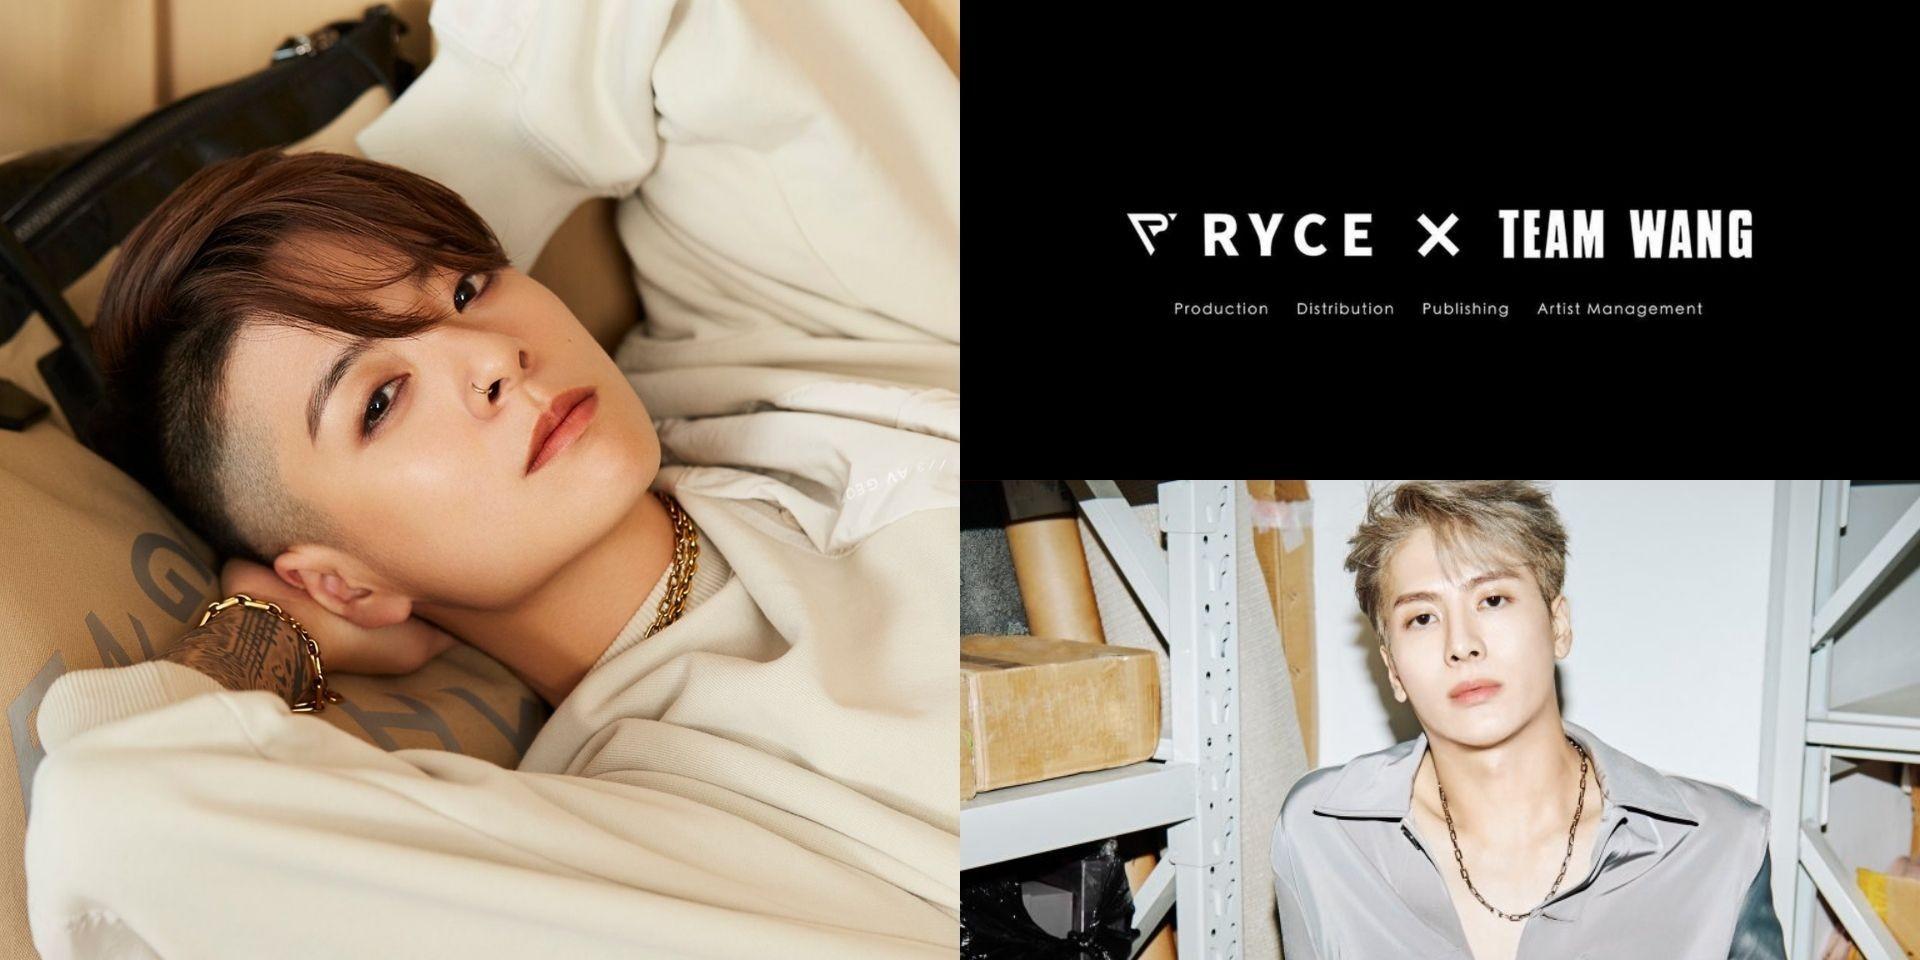 RYCE Entertainment teams up with Jackson Wang's Team Wang, announces Amber Liu as new artist